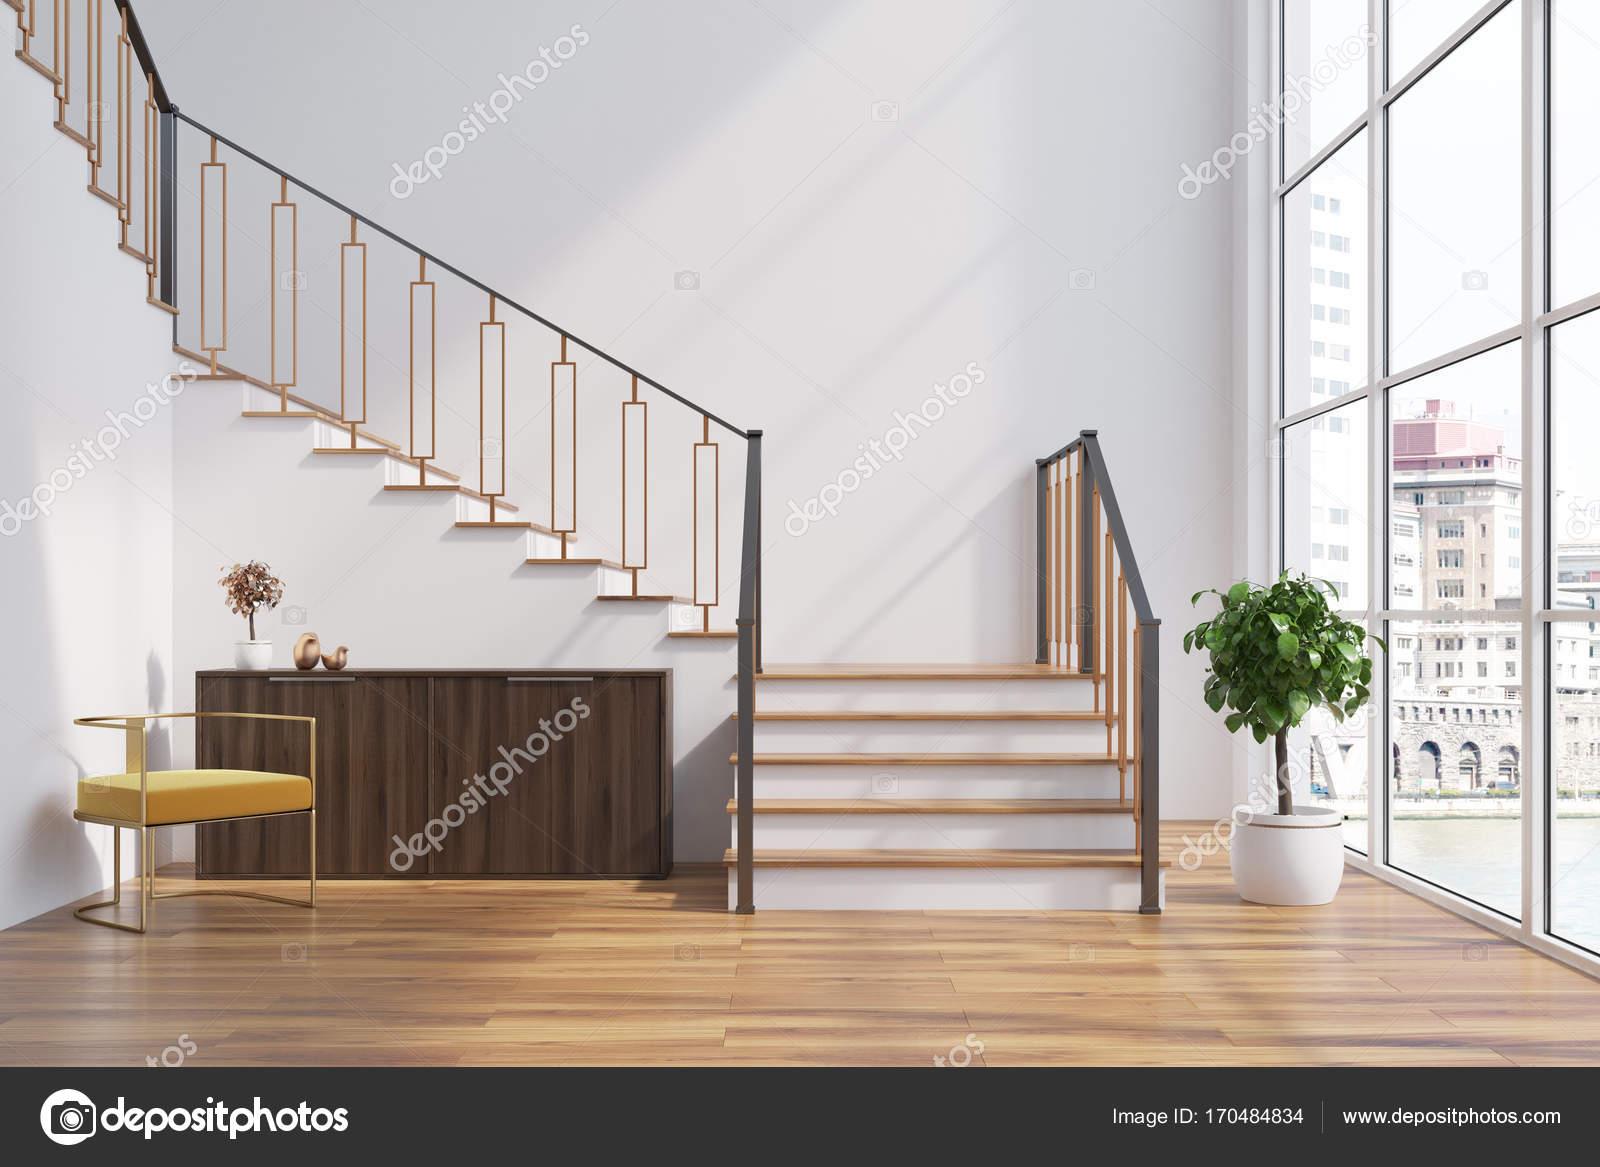 wei e wohnzimmer interieur kommode treppen stockfoto denisismagilov 170484834. Black Bedroom Furniture Sets. Home Design Ideas